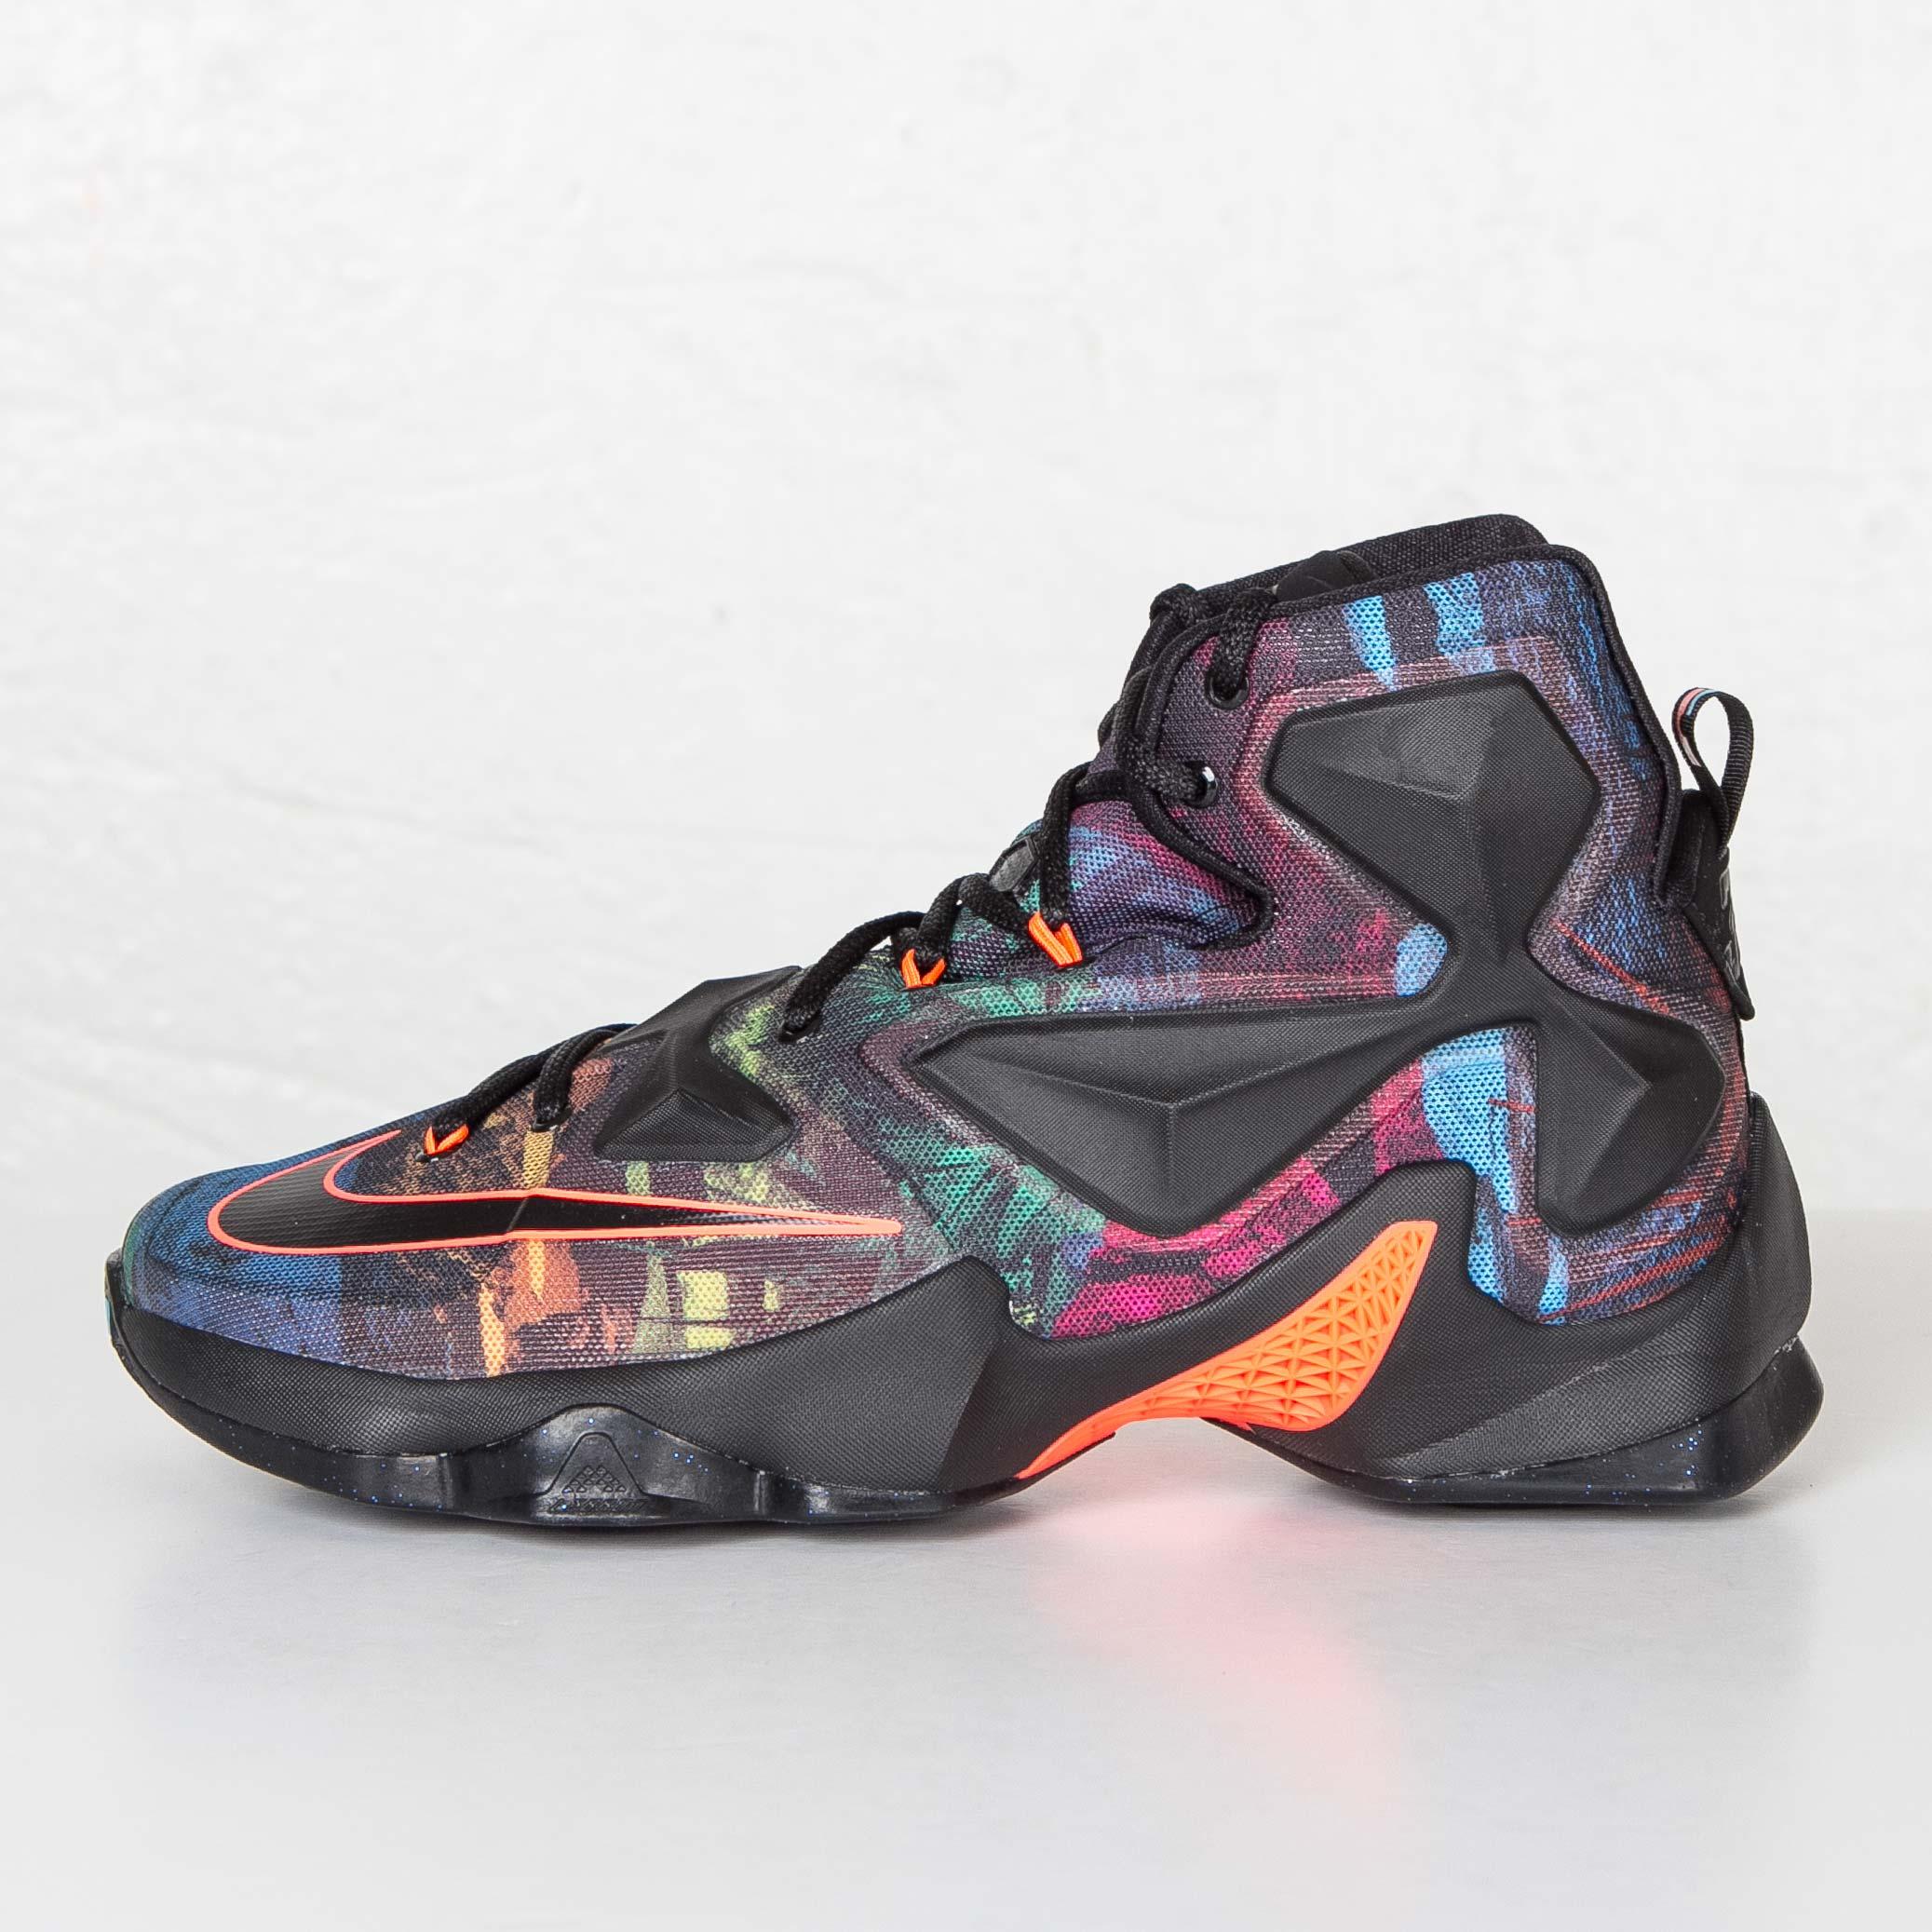 innovative design ad59b 682af Nike Lebron XIII - 807219-008 - Sneakersnstuff   sneakers   streetwear  online since 1999